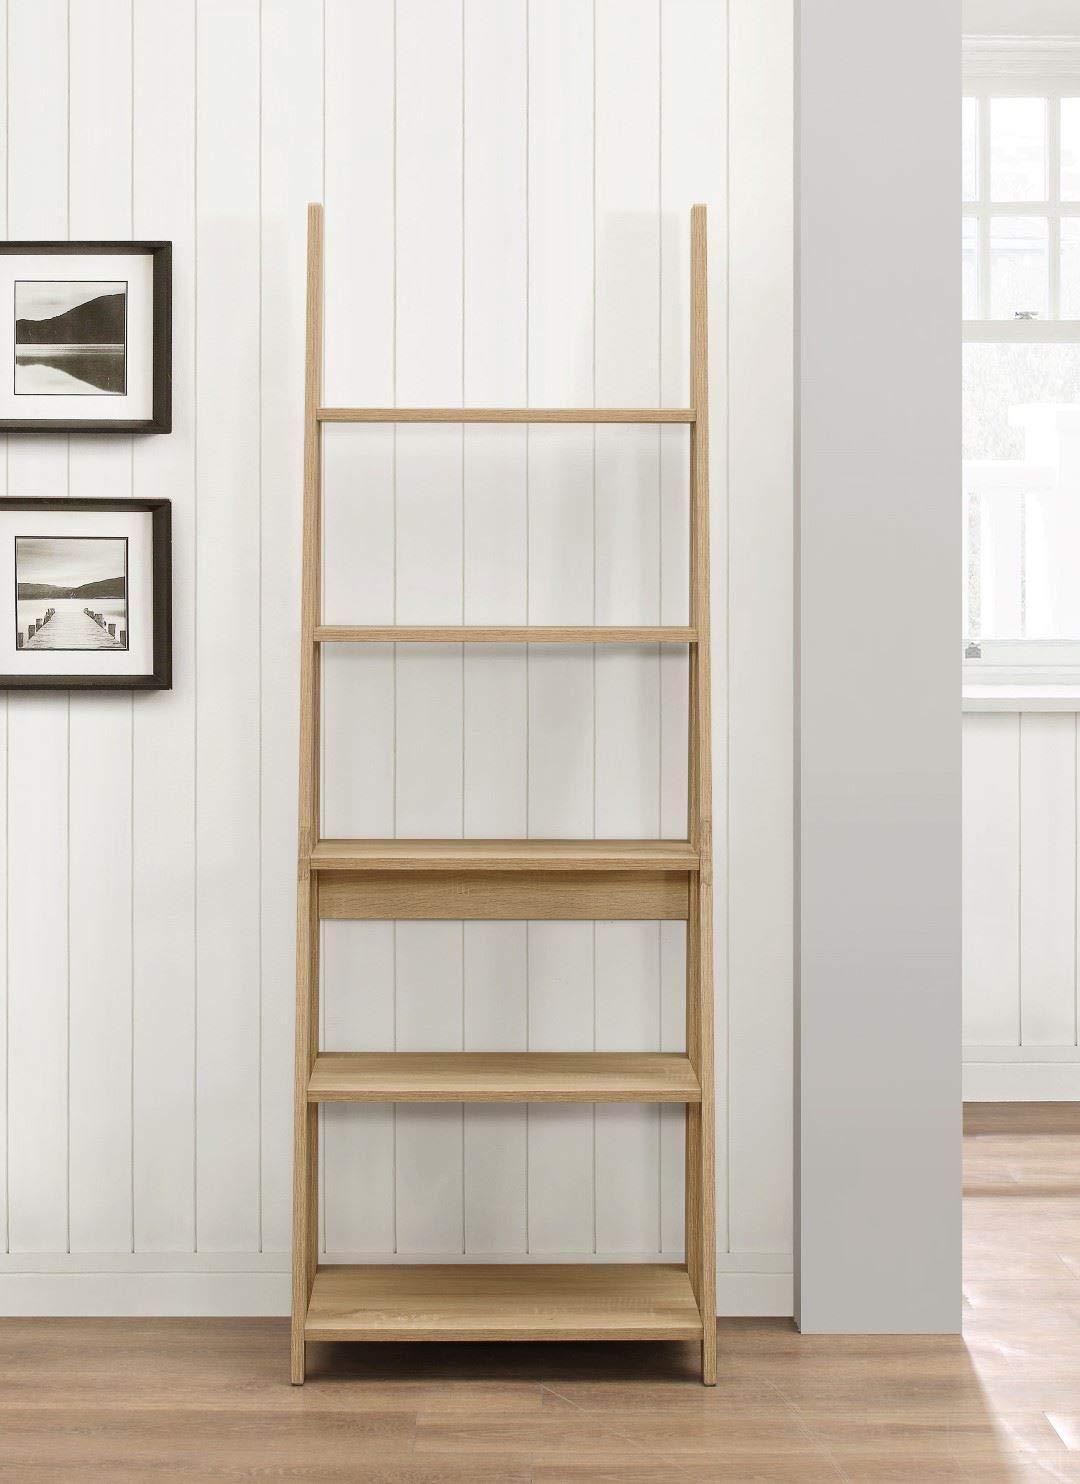 61yDEMWPdOL - Birlea, Dayton, Ladder Bookcase, Wood, Oak, One Size